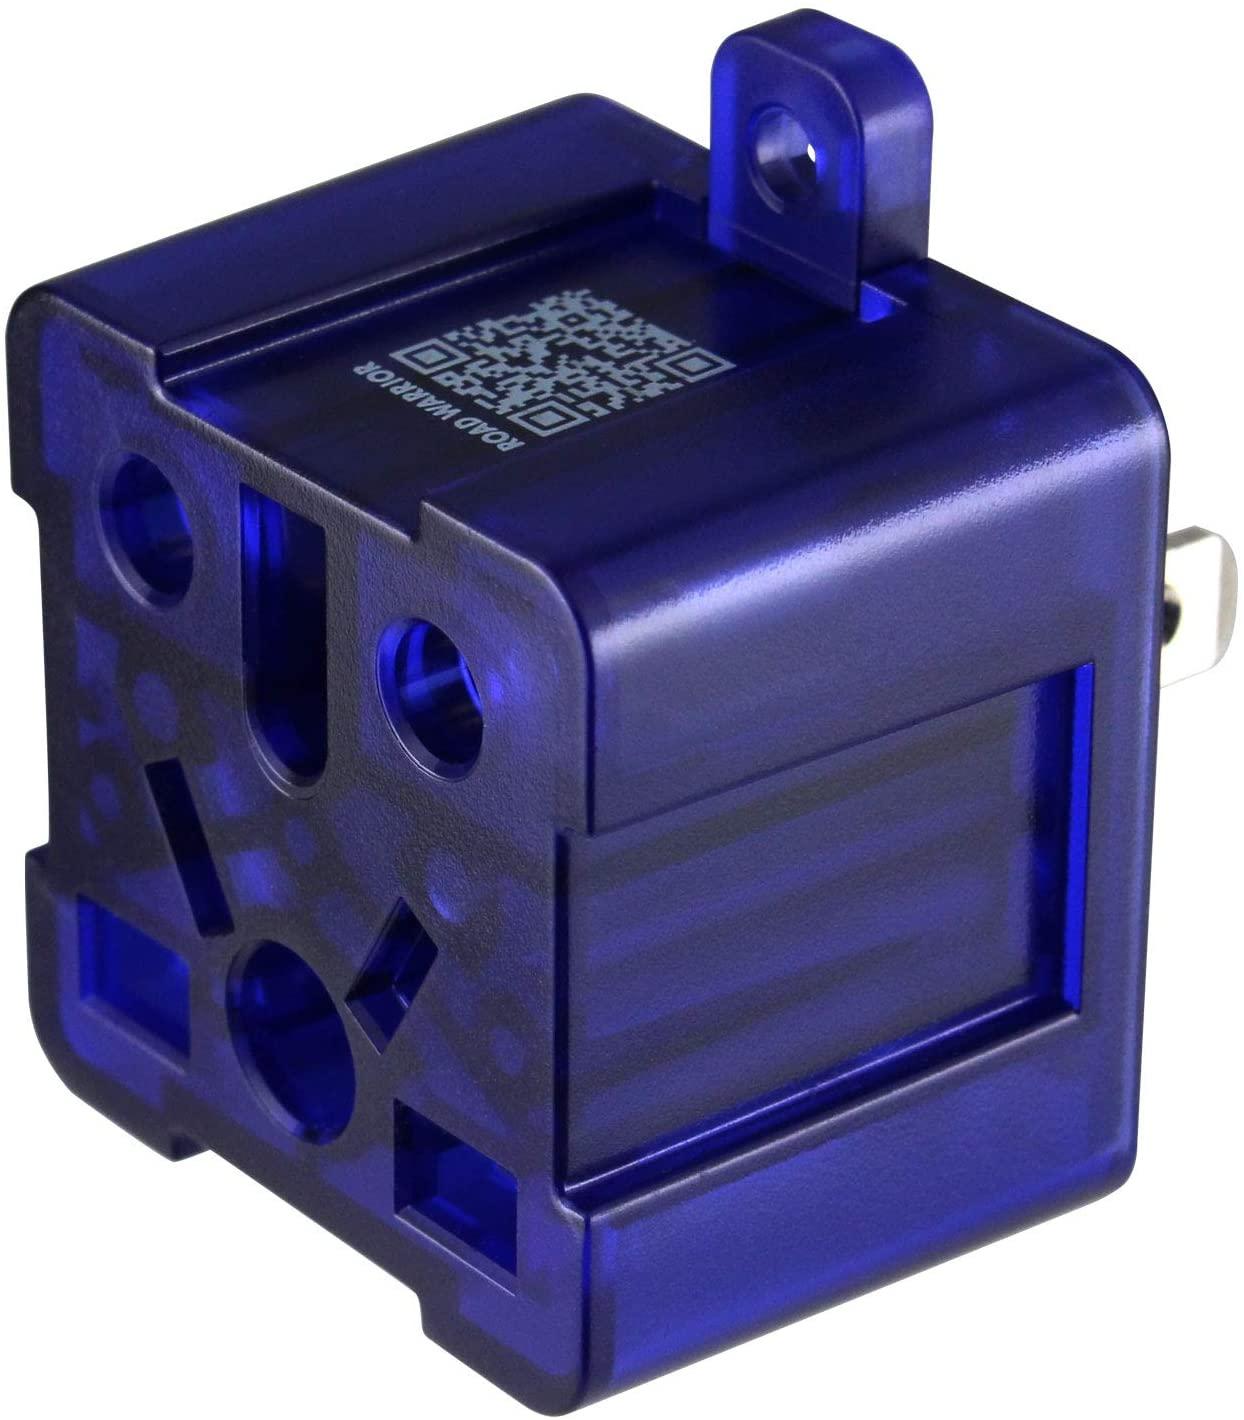 ROAD WARRIOR USA Plug Adapter 13A - EU/UK/AUS/China/India to US (Type A) - RW125BL-US